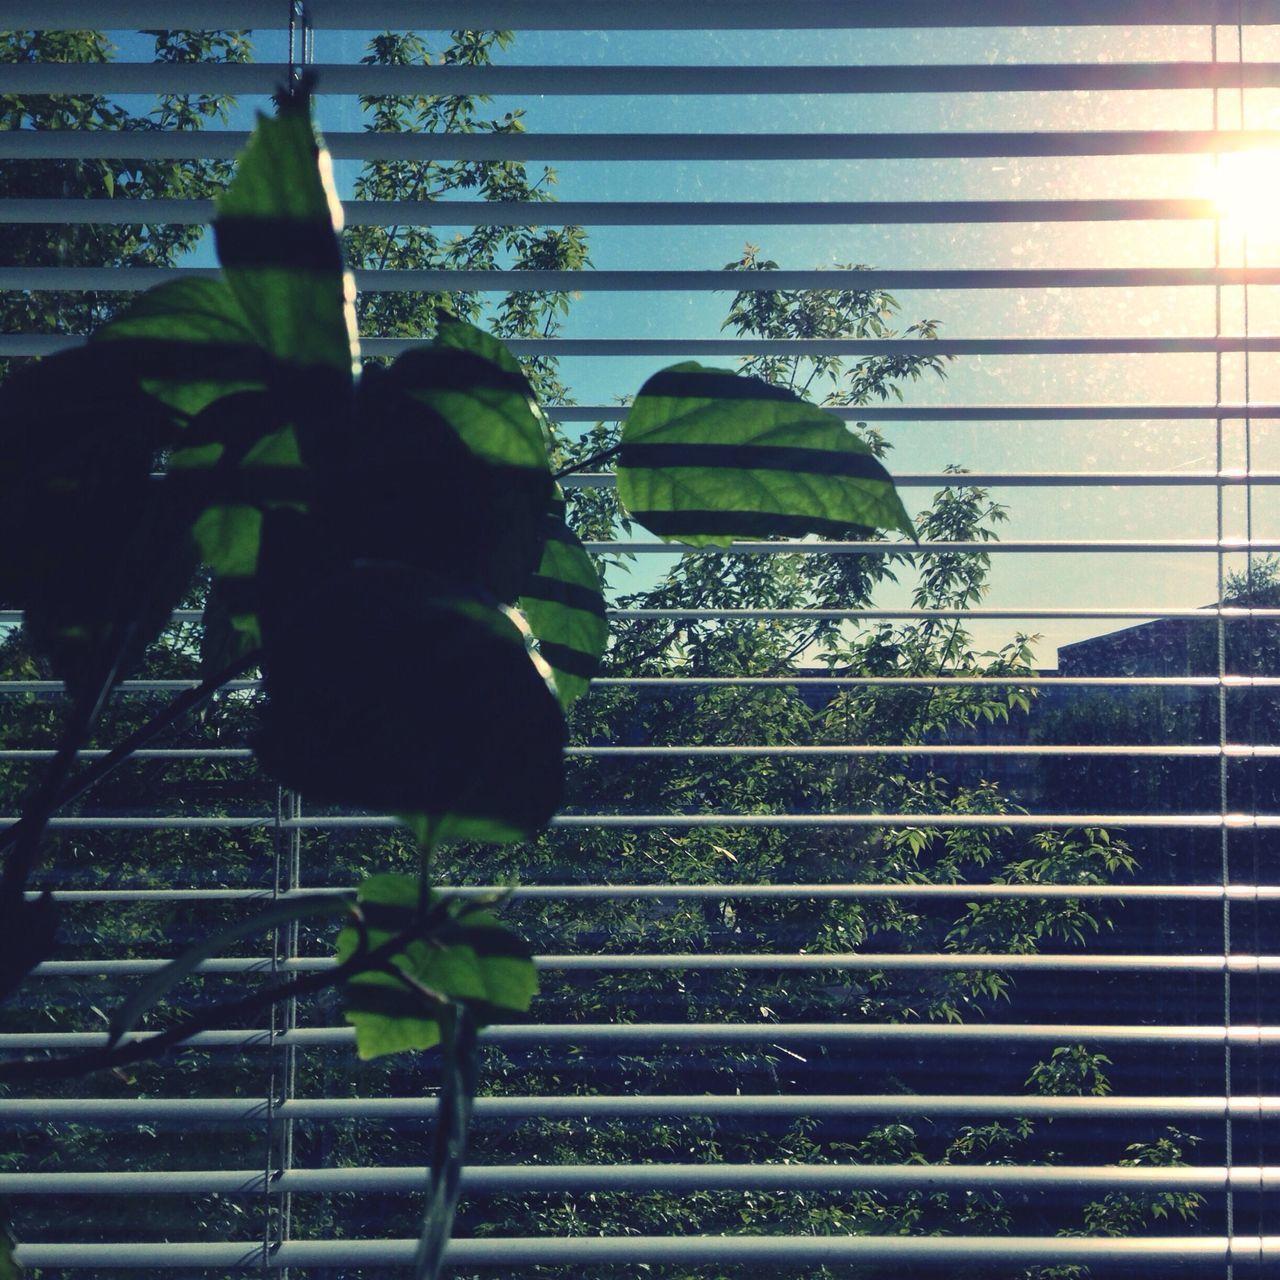 Windows 3.11 Windows Window Plants Roller Blind Lamellae Leipzig Home Sunset GDR Minimalism